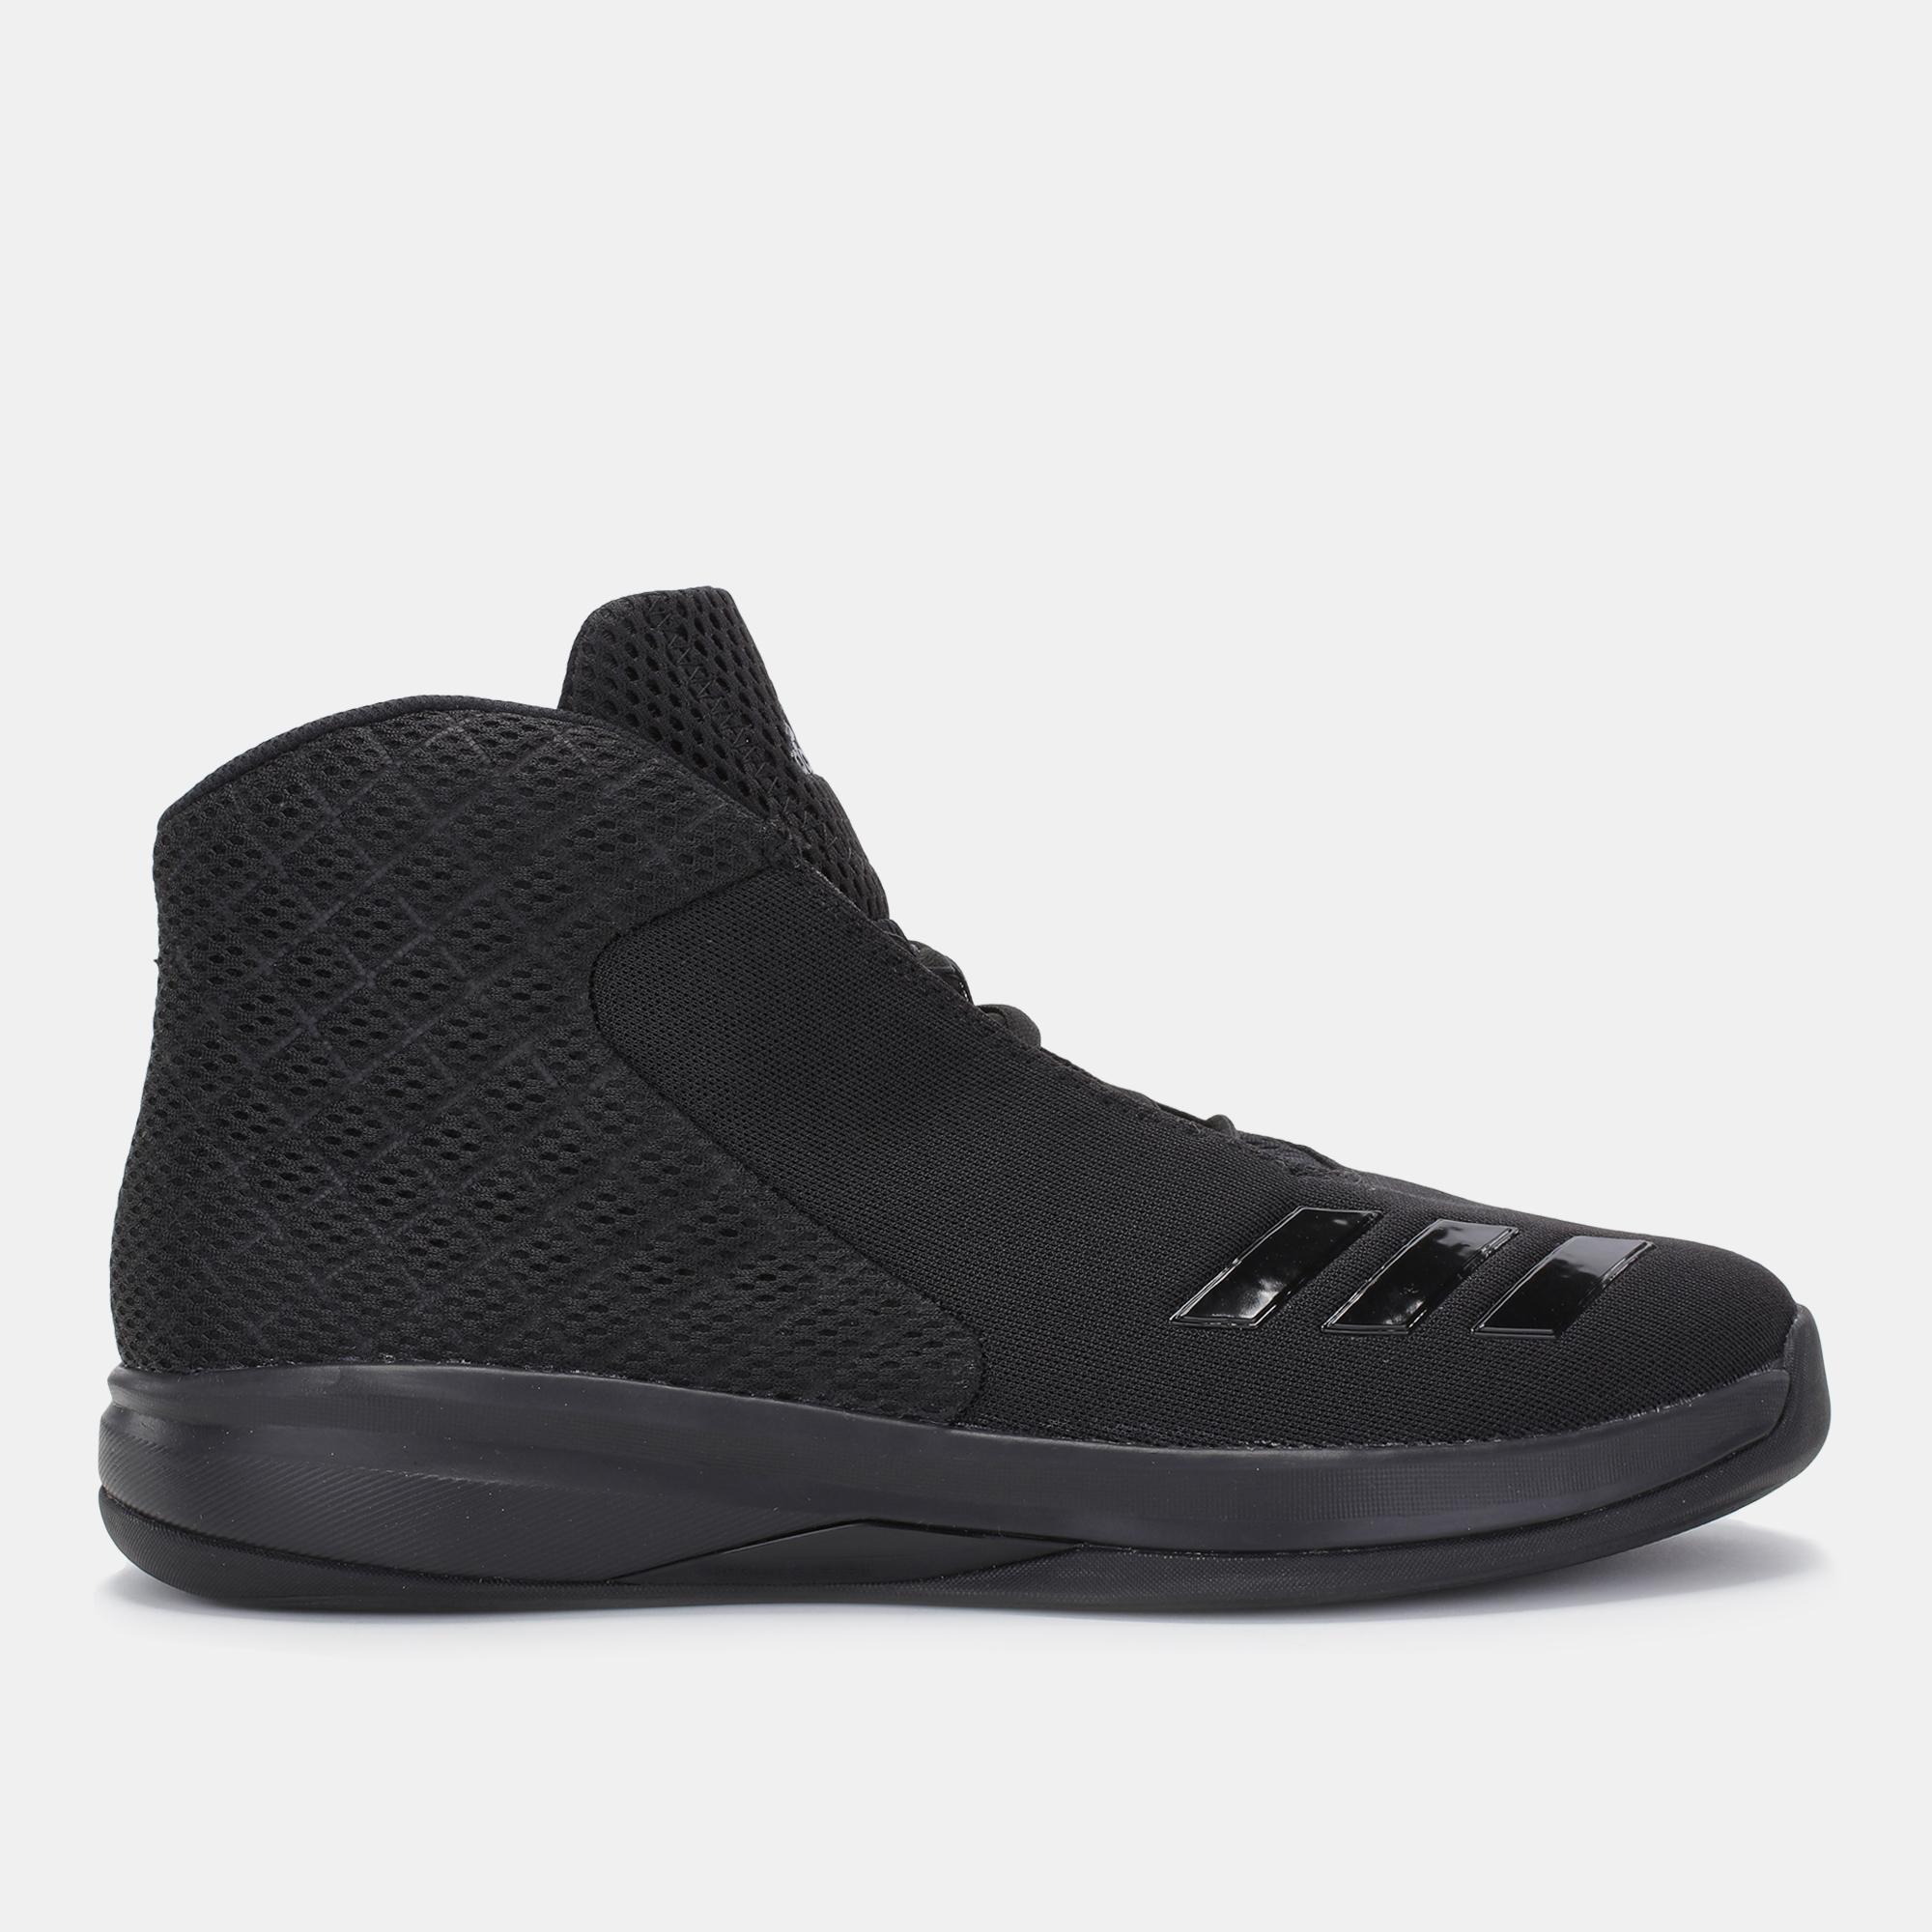 6e5cf79f57a2 Shop Black adidas Court Fury 2016 Shoe for Mens by adidas